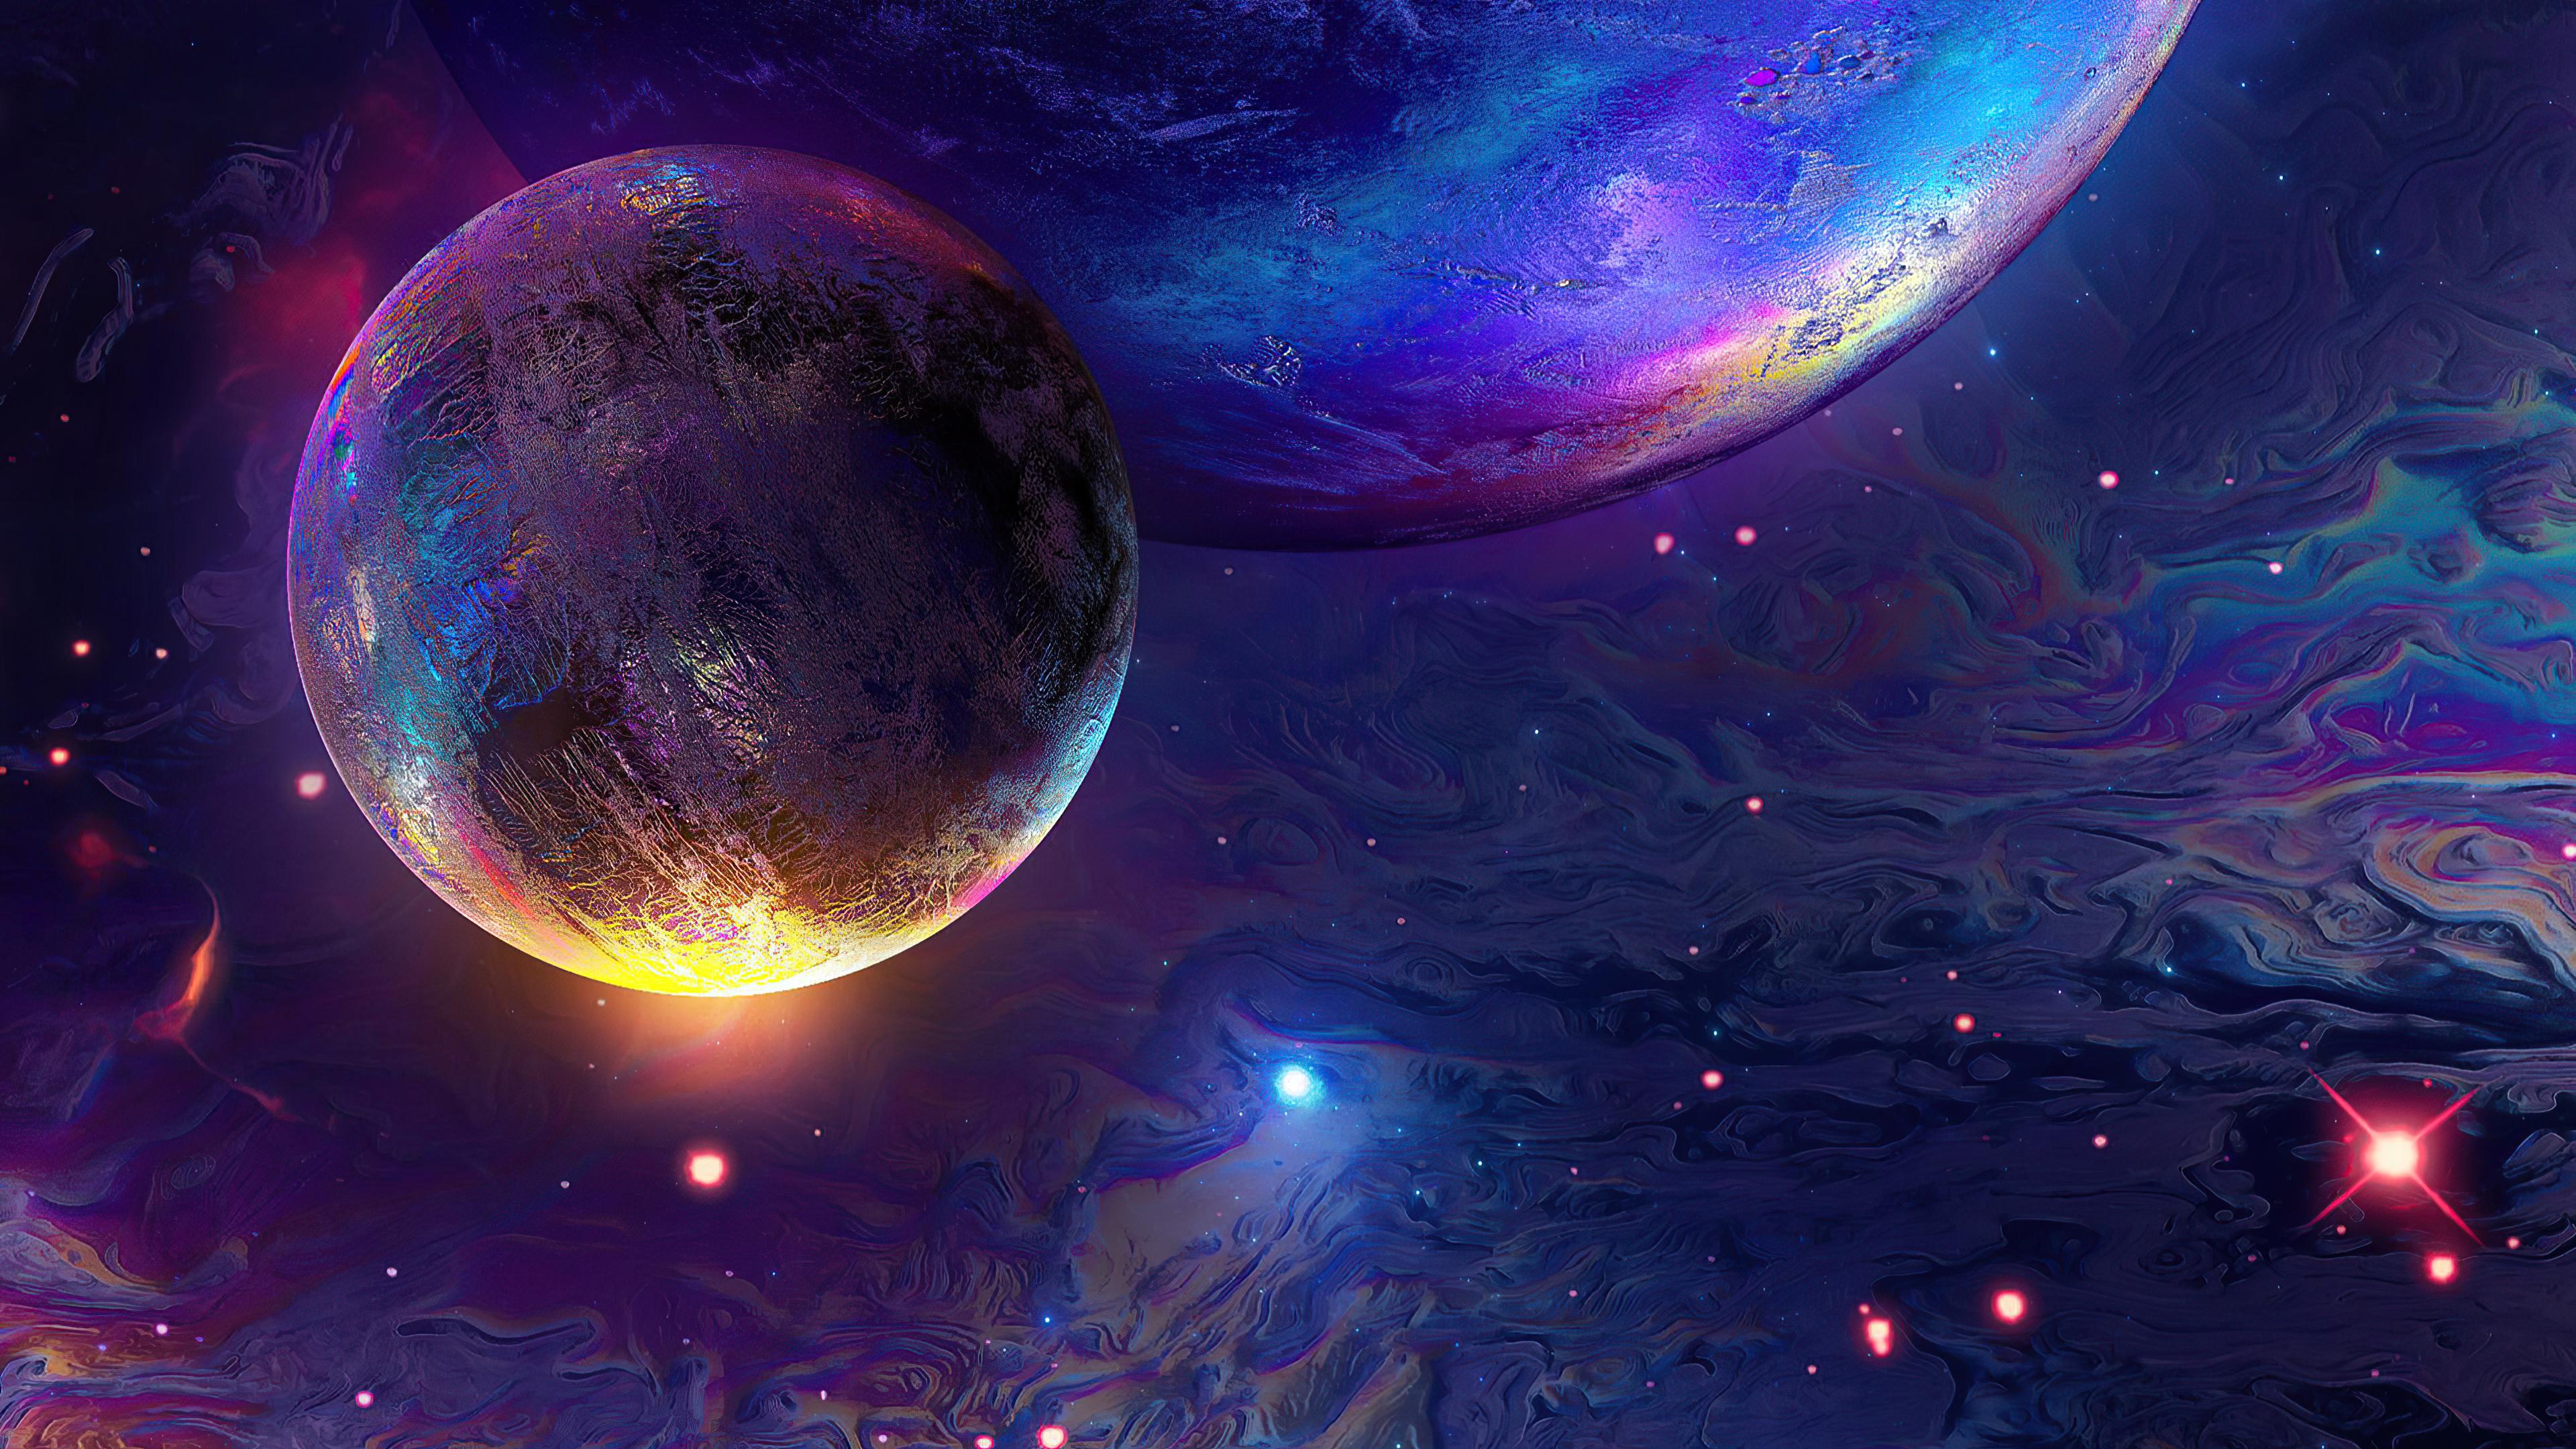 Outer Digital Space, HD Digital Universe, 4k Wallpapers ...